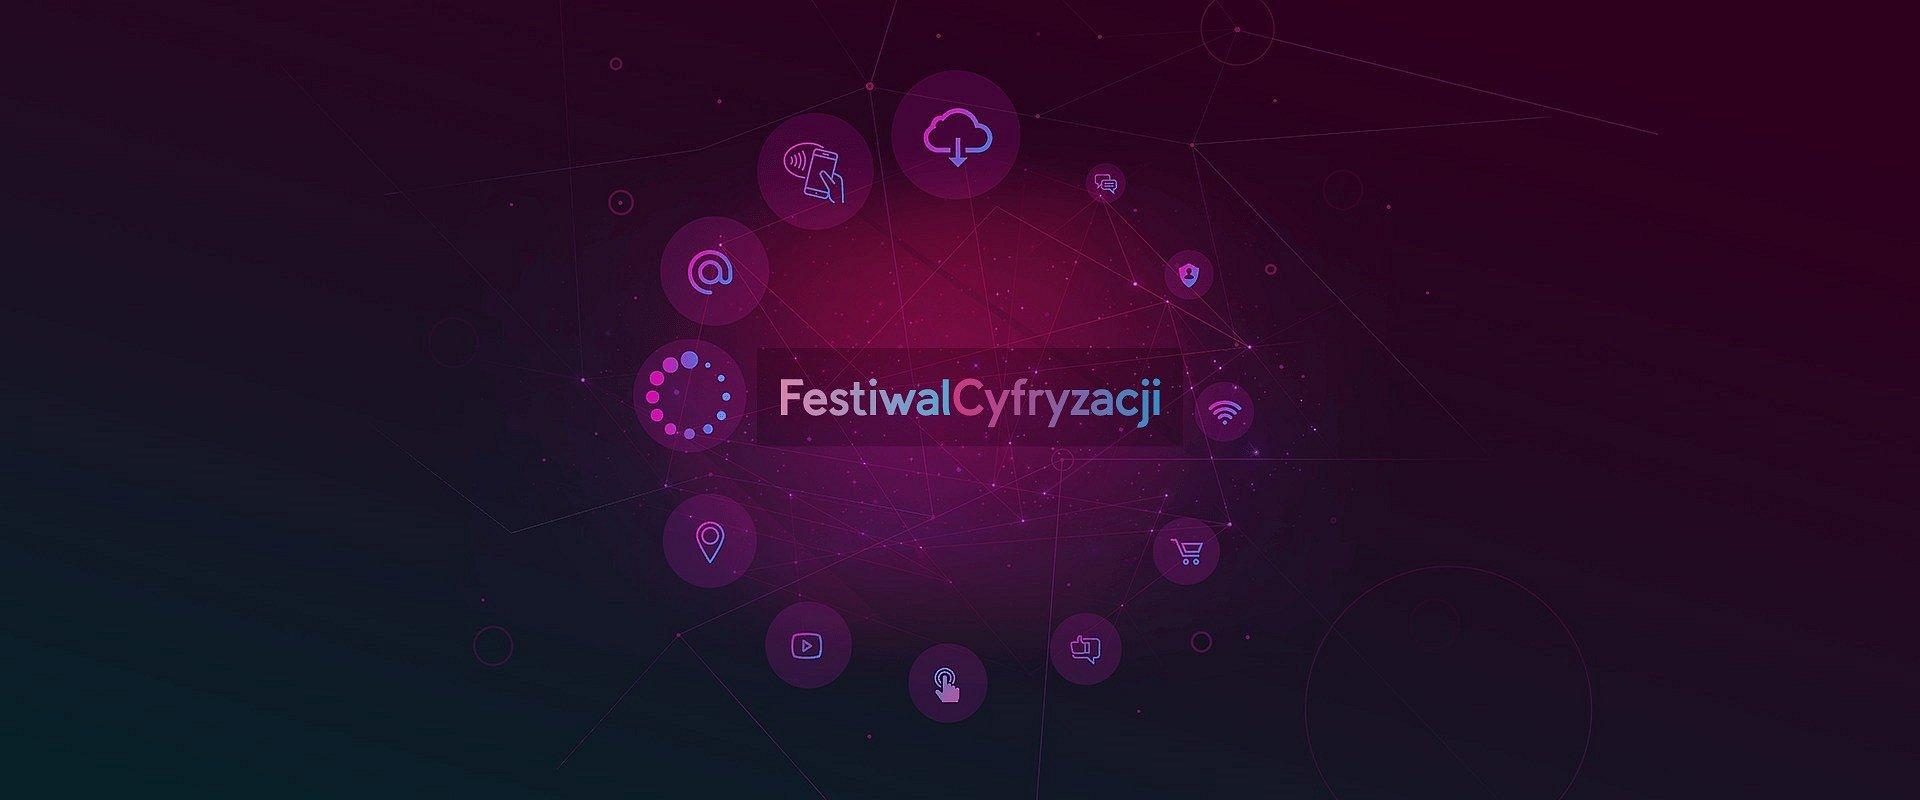 Wielki sukces Festiwalu Cyfryzacji